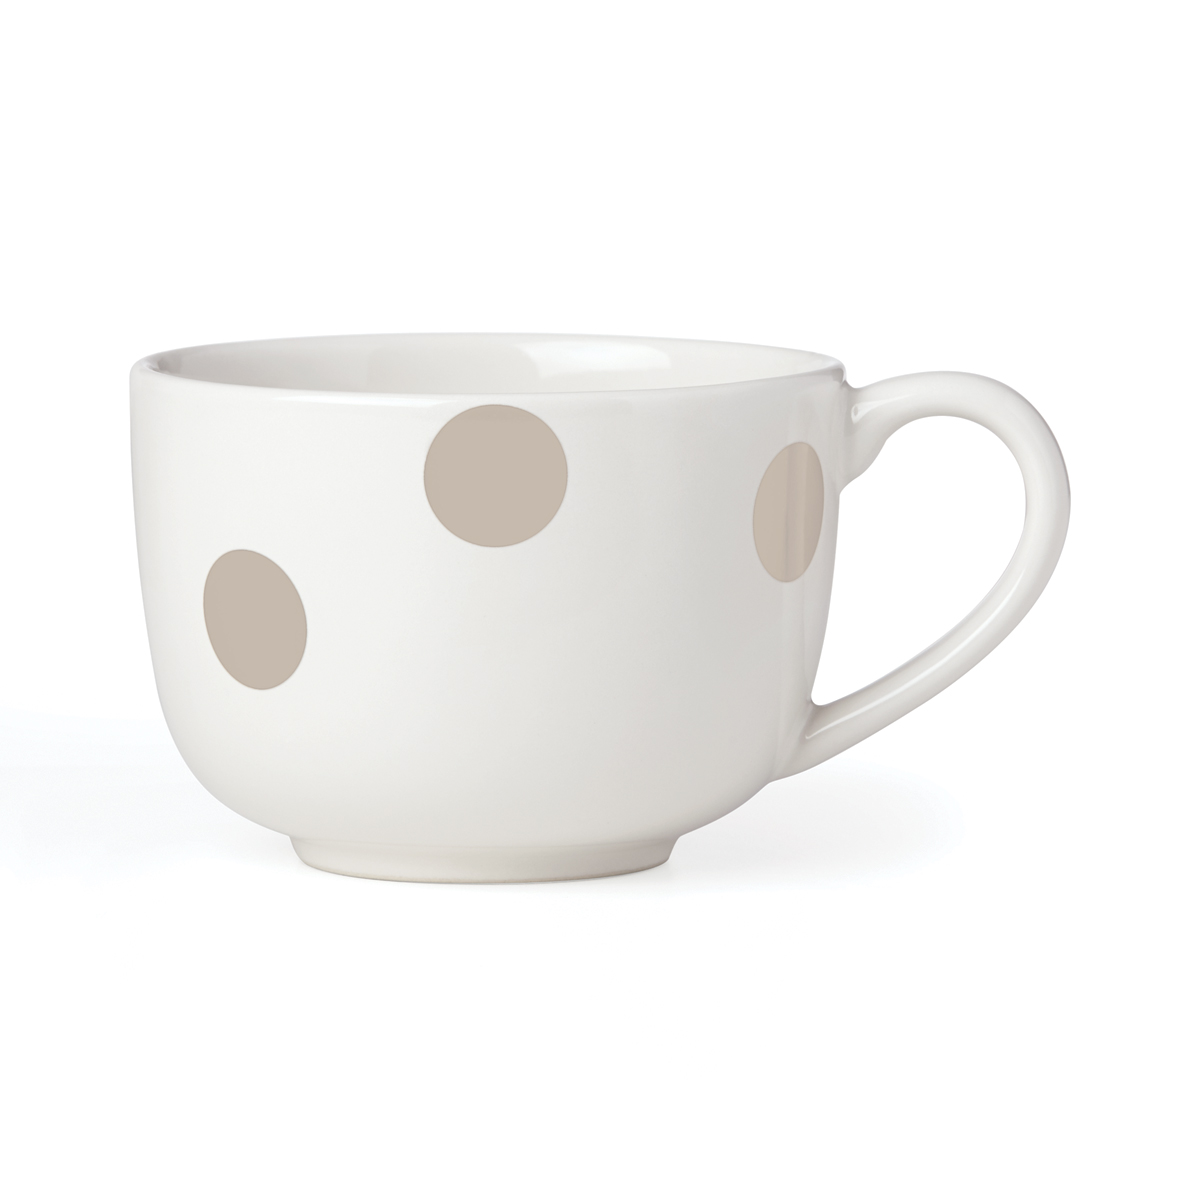 Kate Spade China by Lenox, Deco Dot Beige Latte Mug